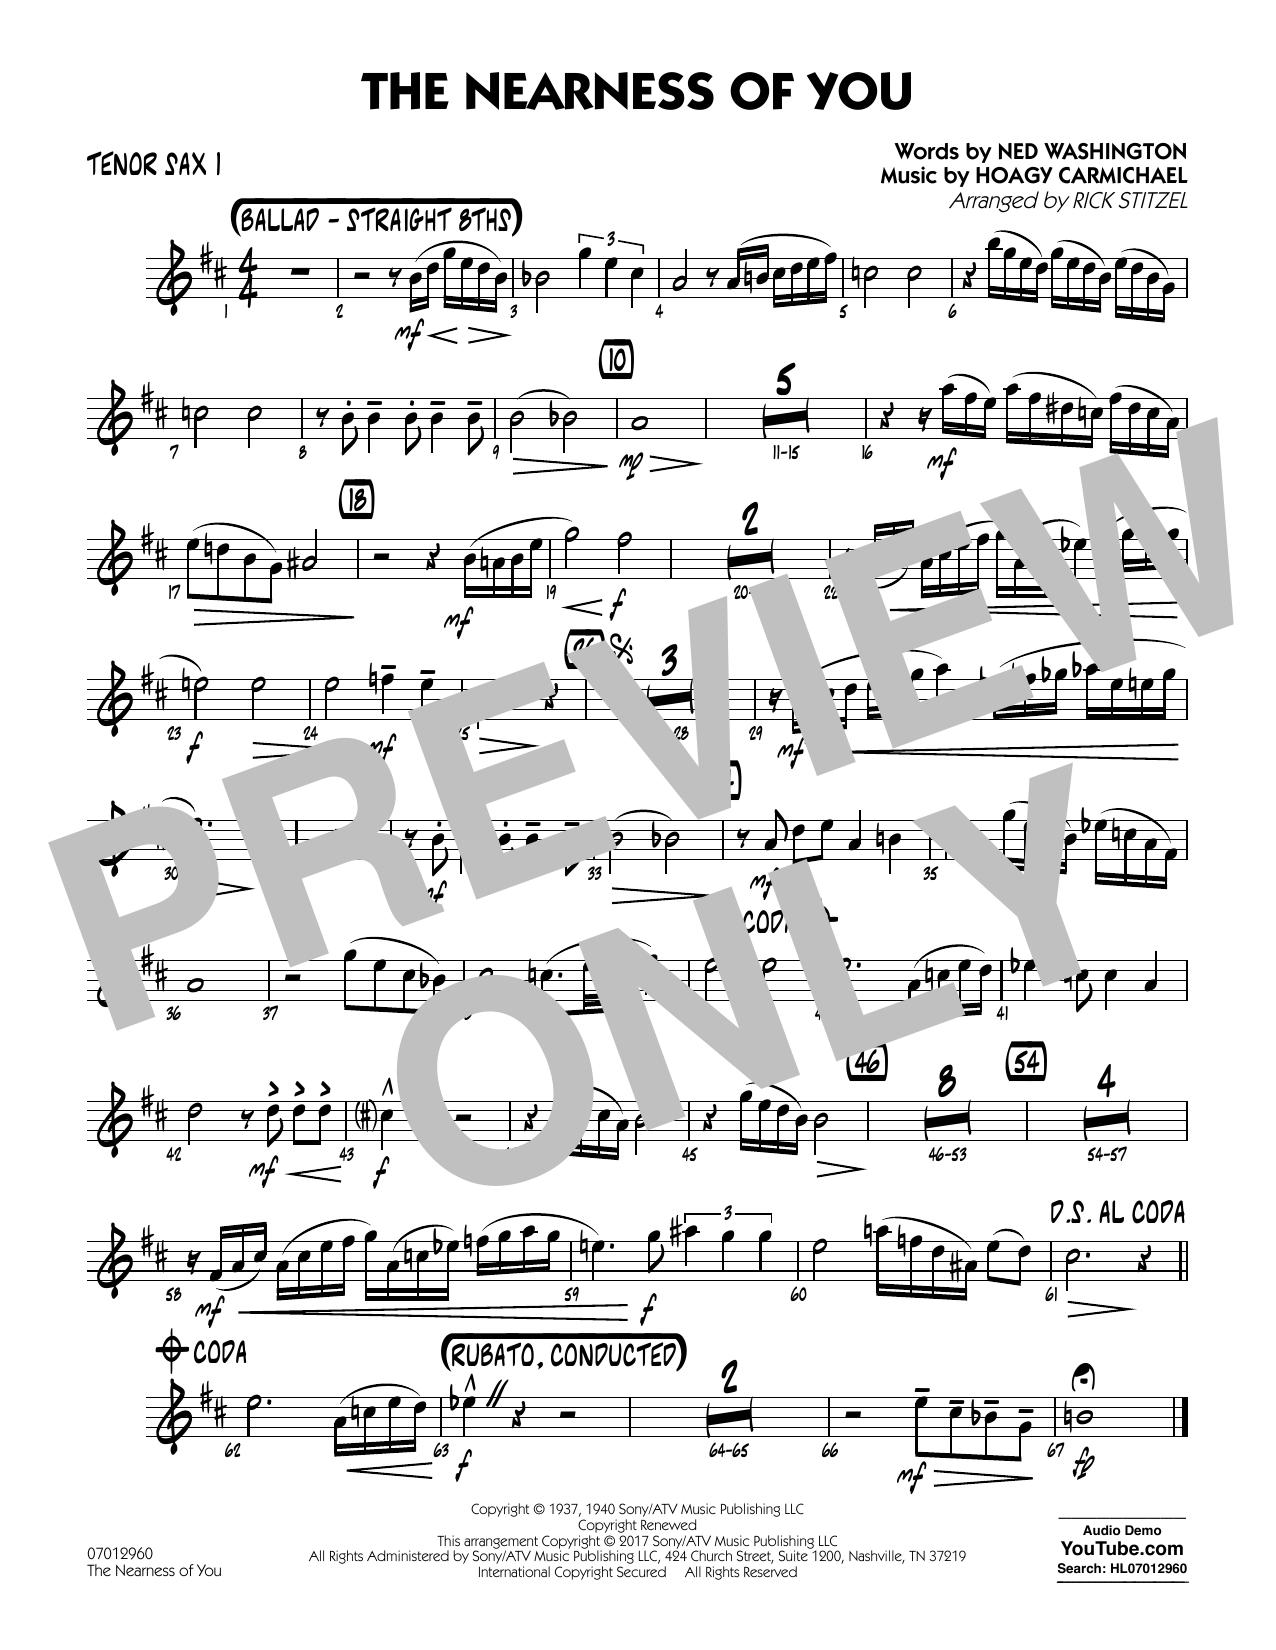 George Shearing - The Nearness of You (Key: C) - Tenor Sax 1